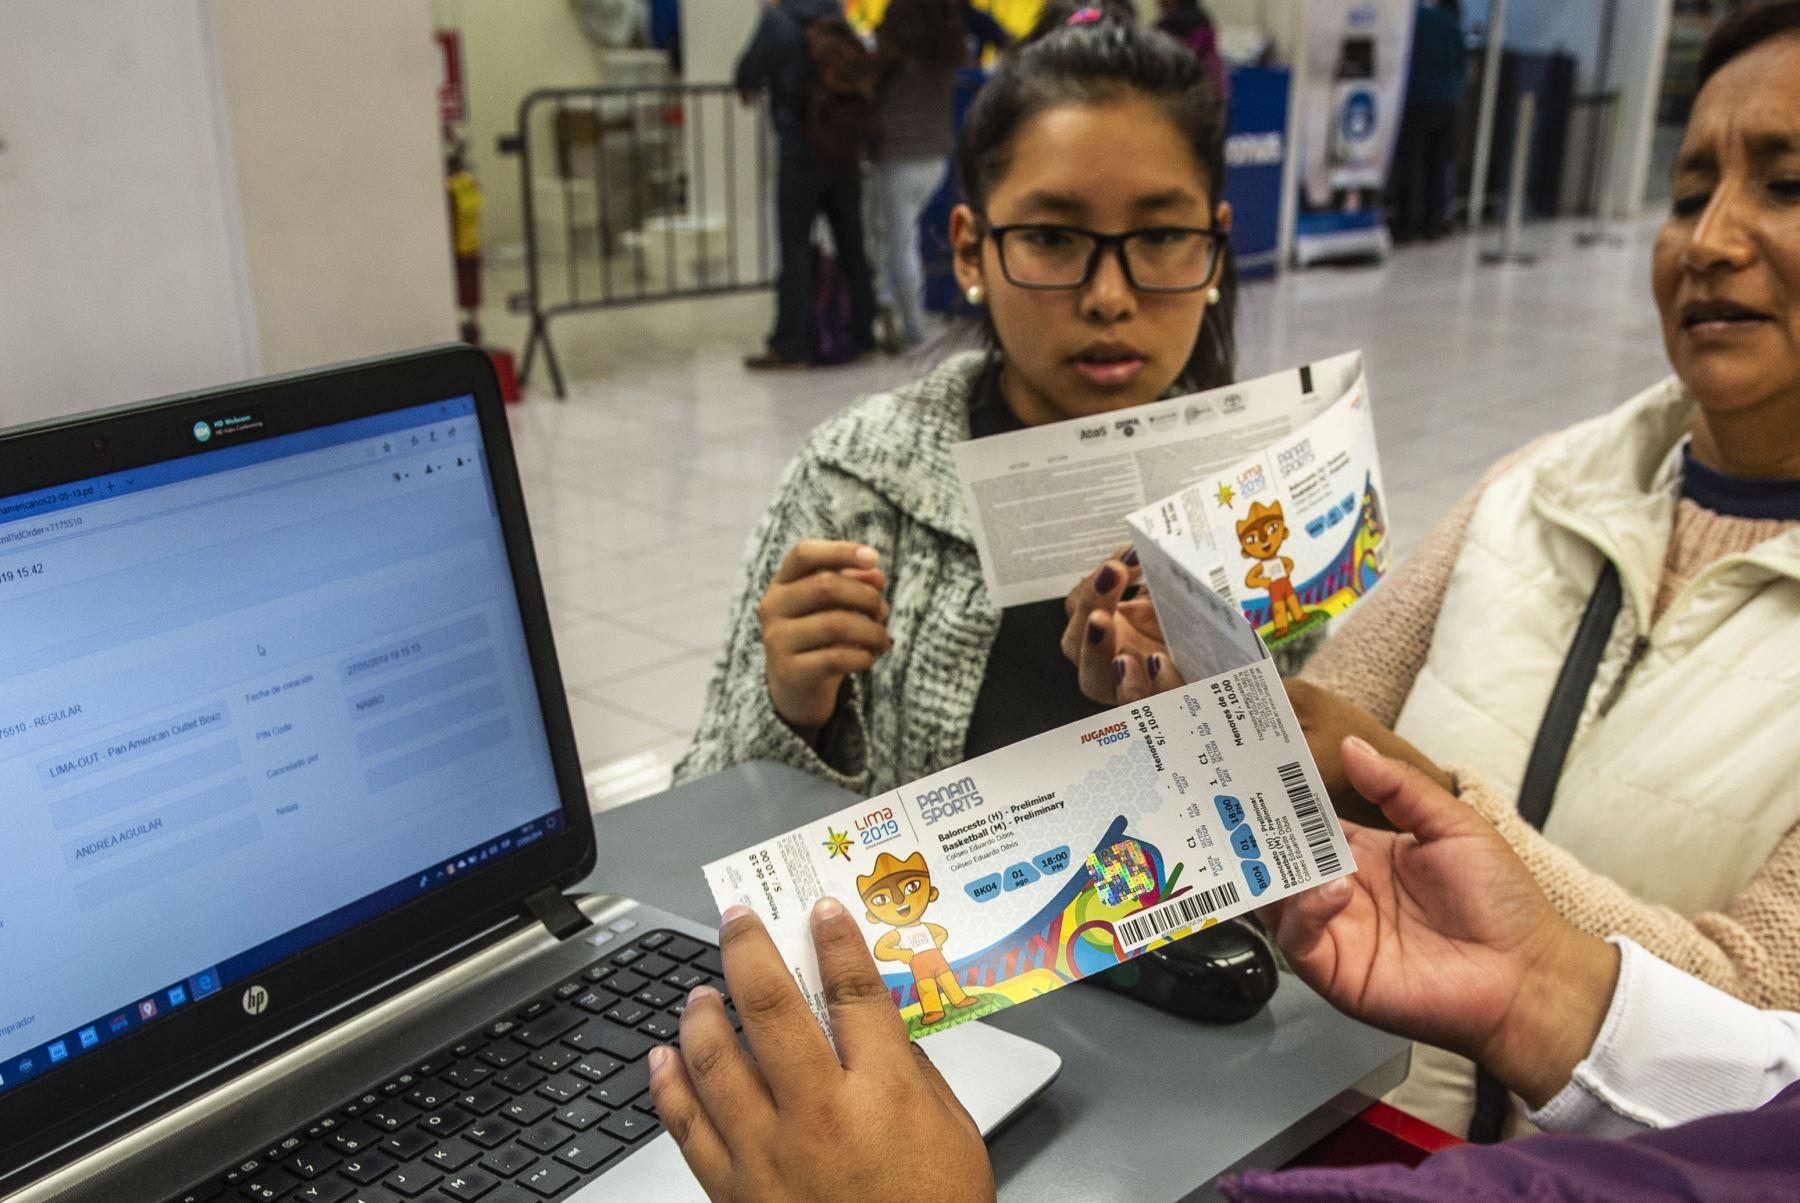 Calendario Juegos Panamericanos Lima 2019 Entradas.Lima 2019 Mas De 25 000 Entradas Se Vendieron Durante